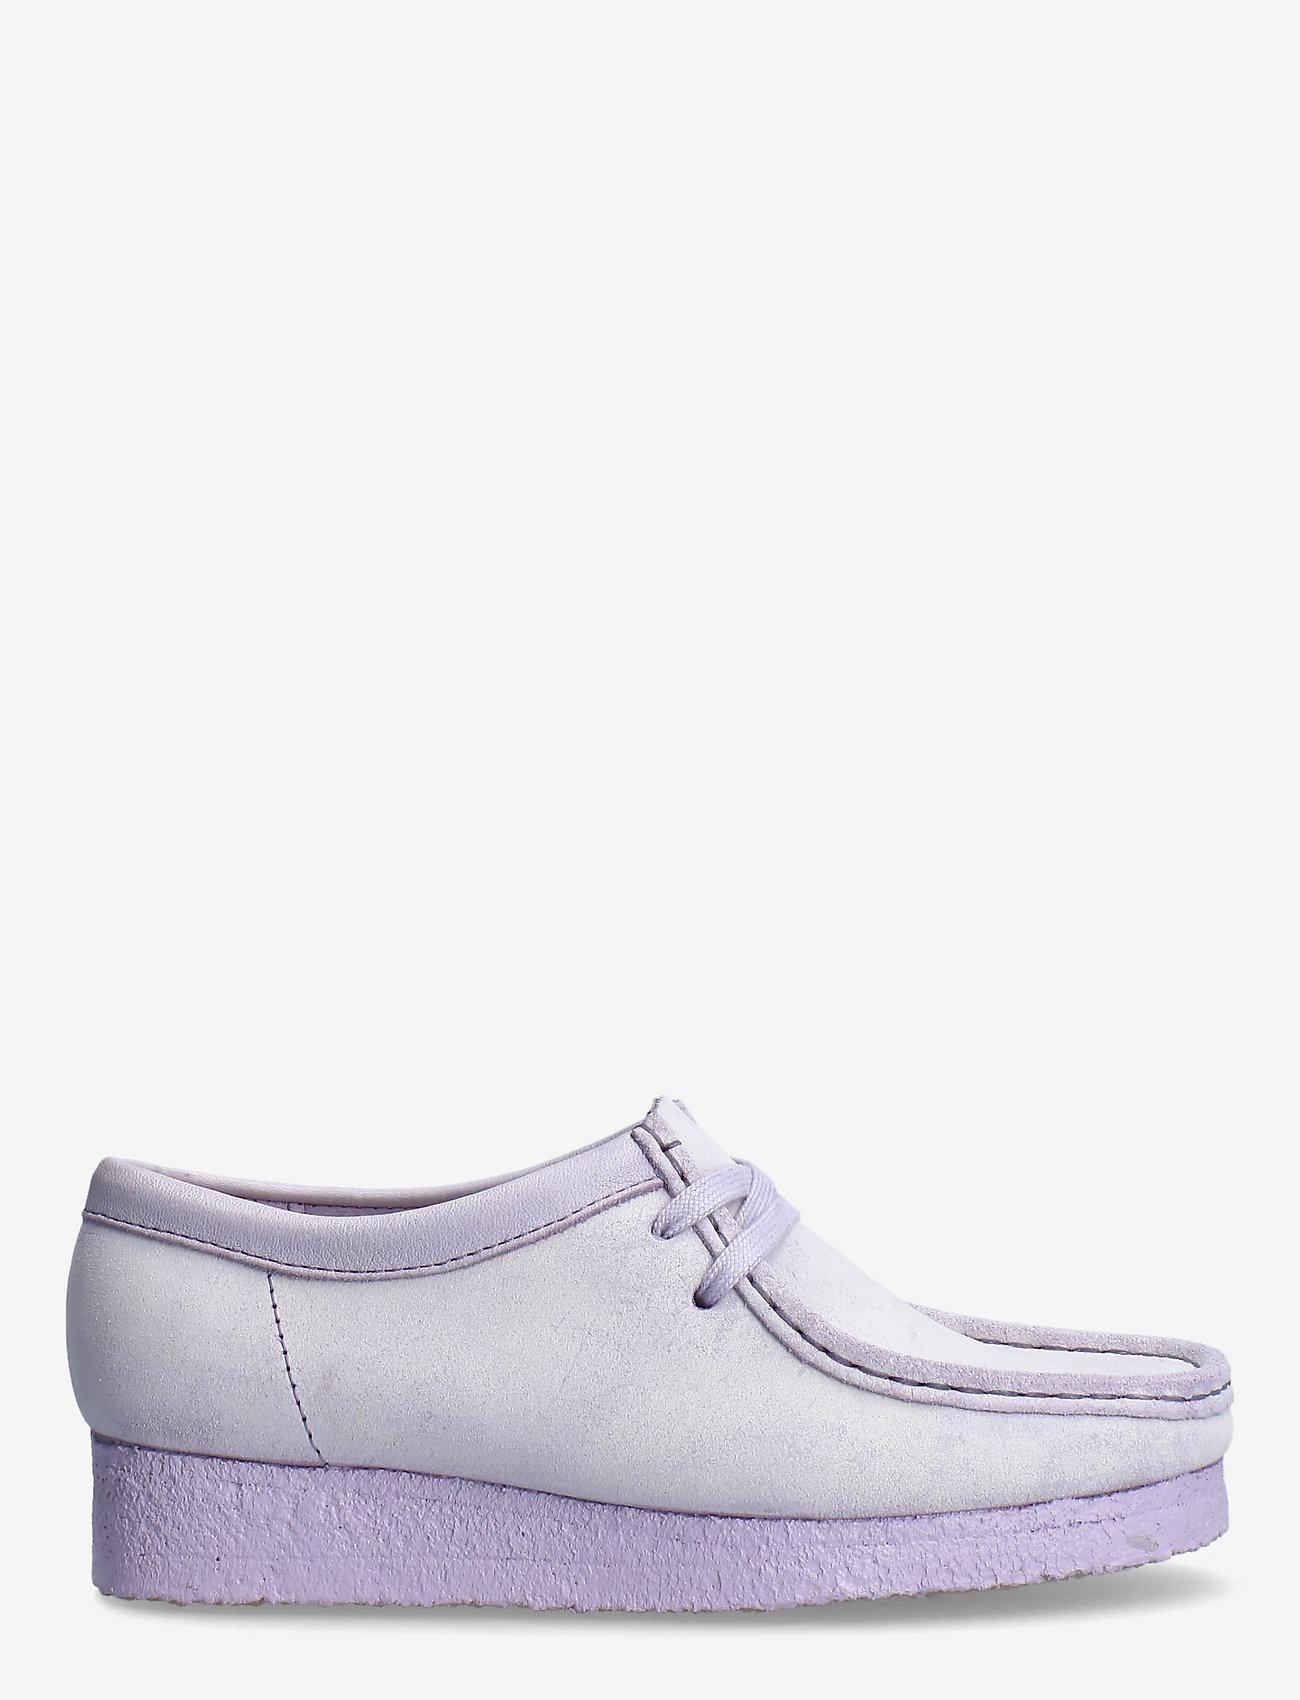 Clarks Originals - Wallabee. - loafers - lilac suede - 1